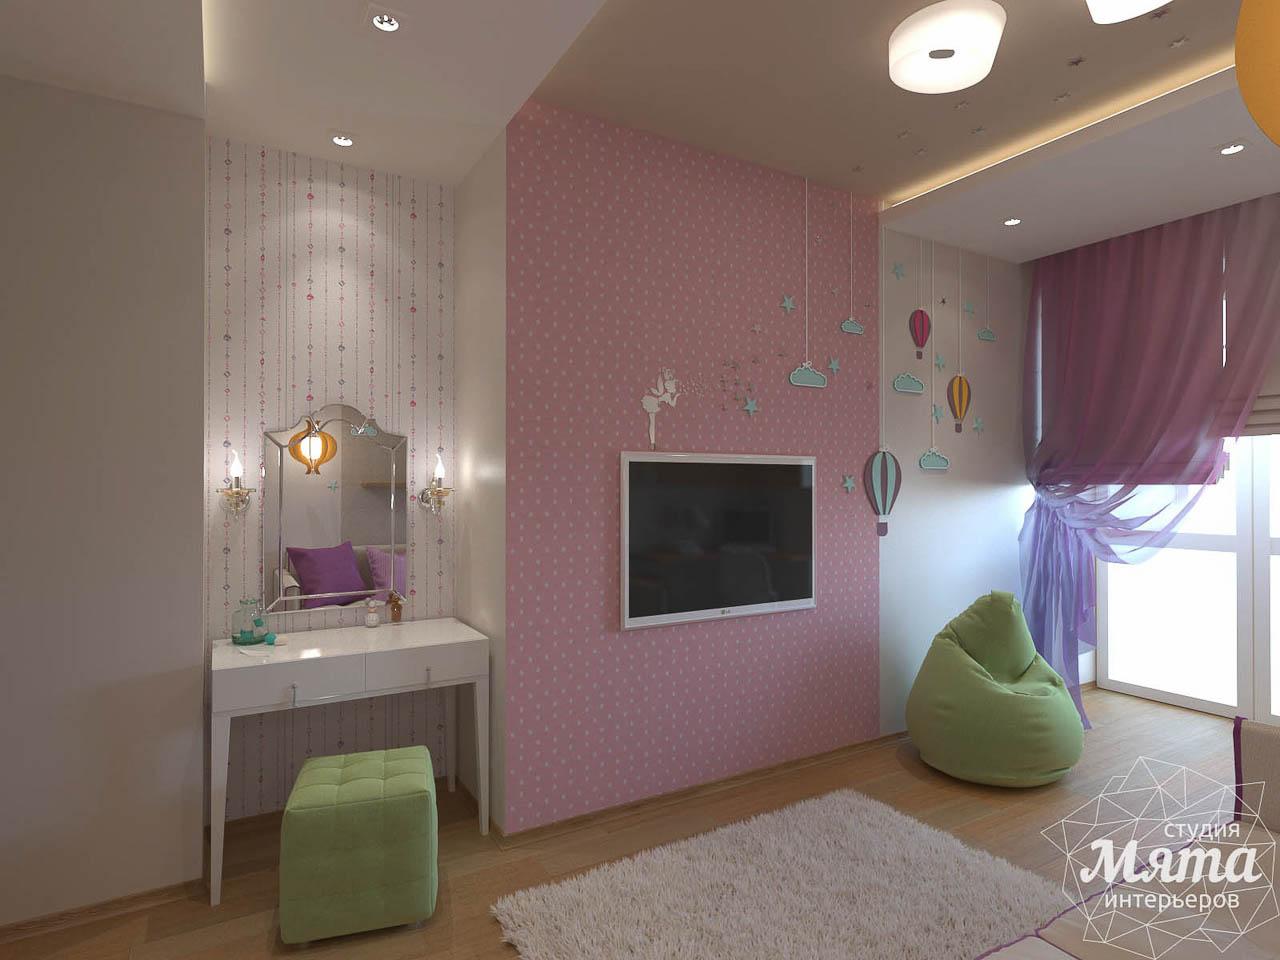 Дизайн интерьера трехкомнатной квартиры по ул. Мельникова 27 img765100039